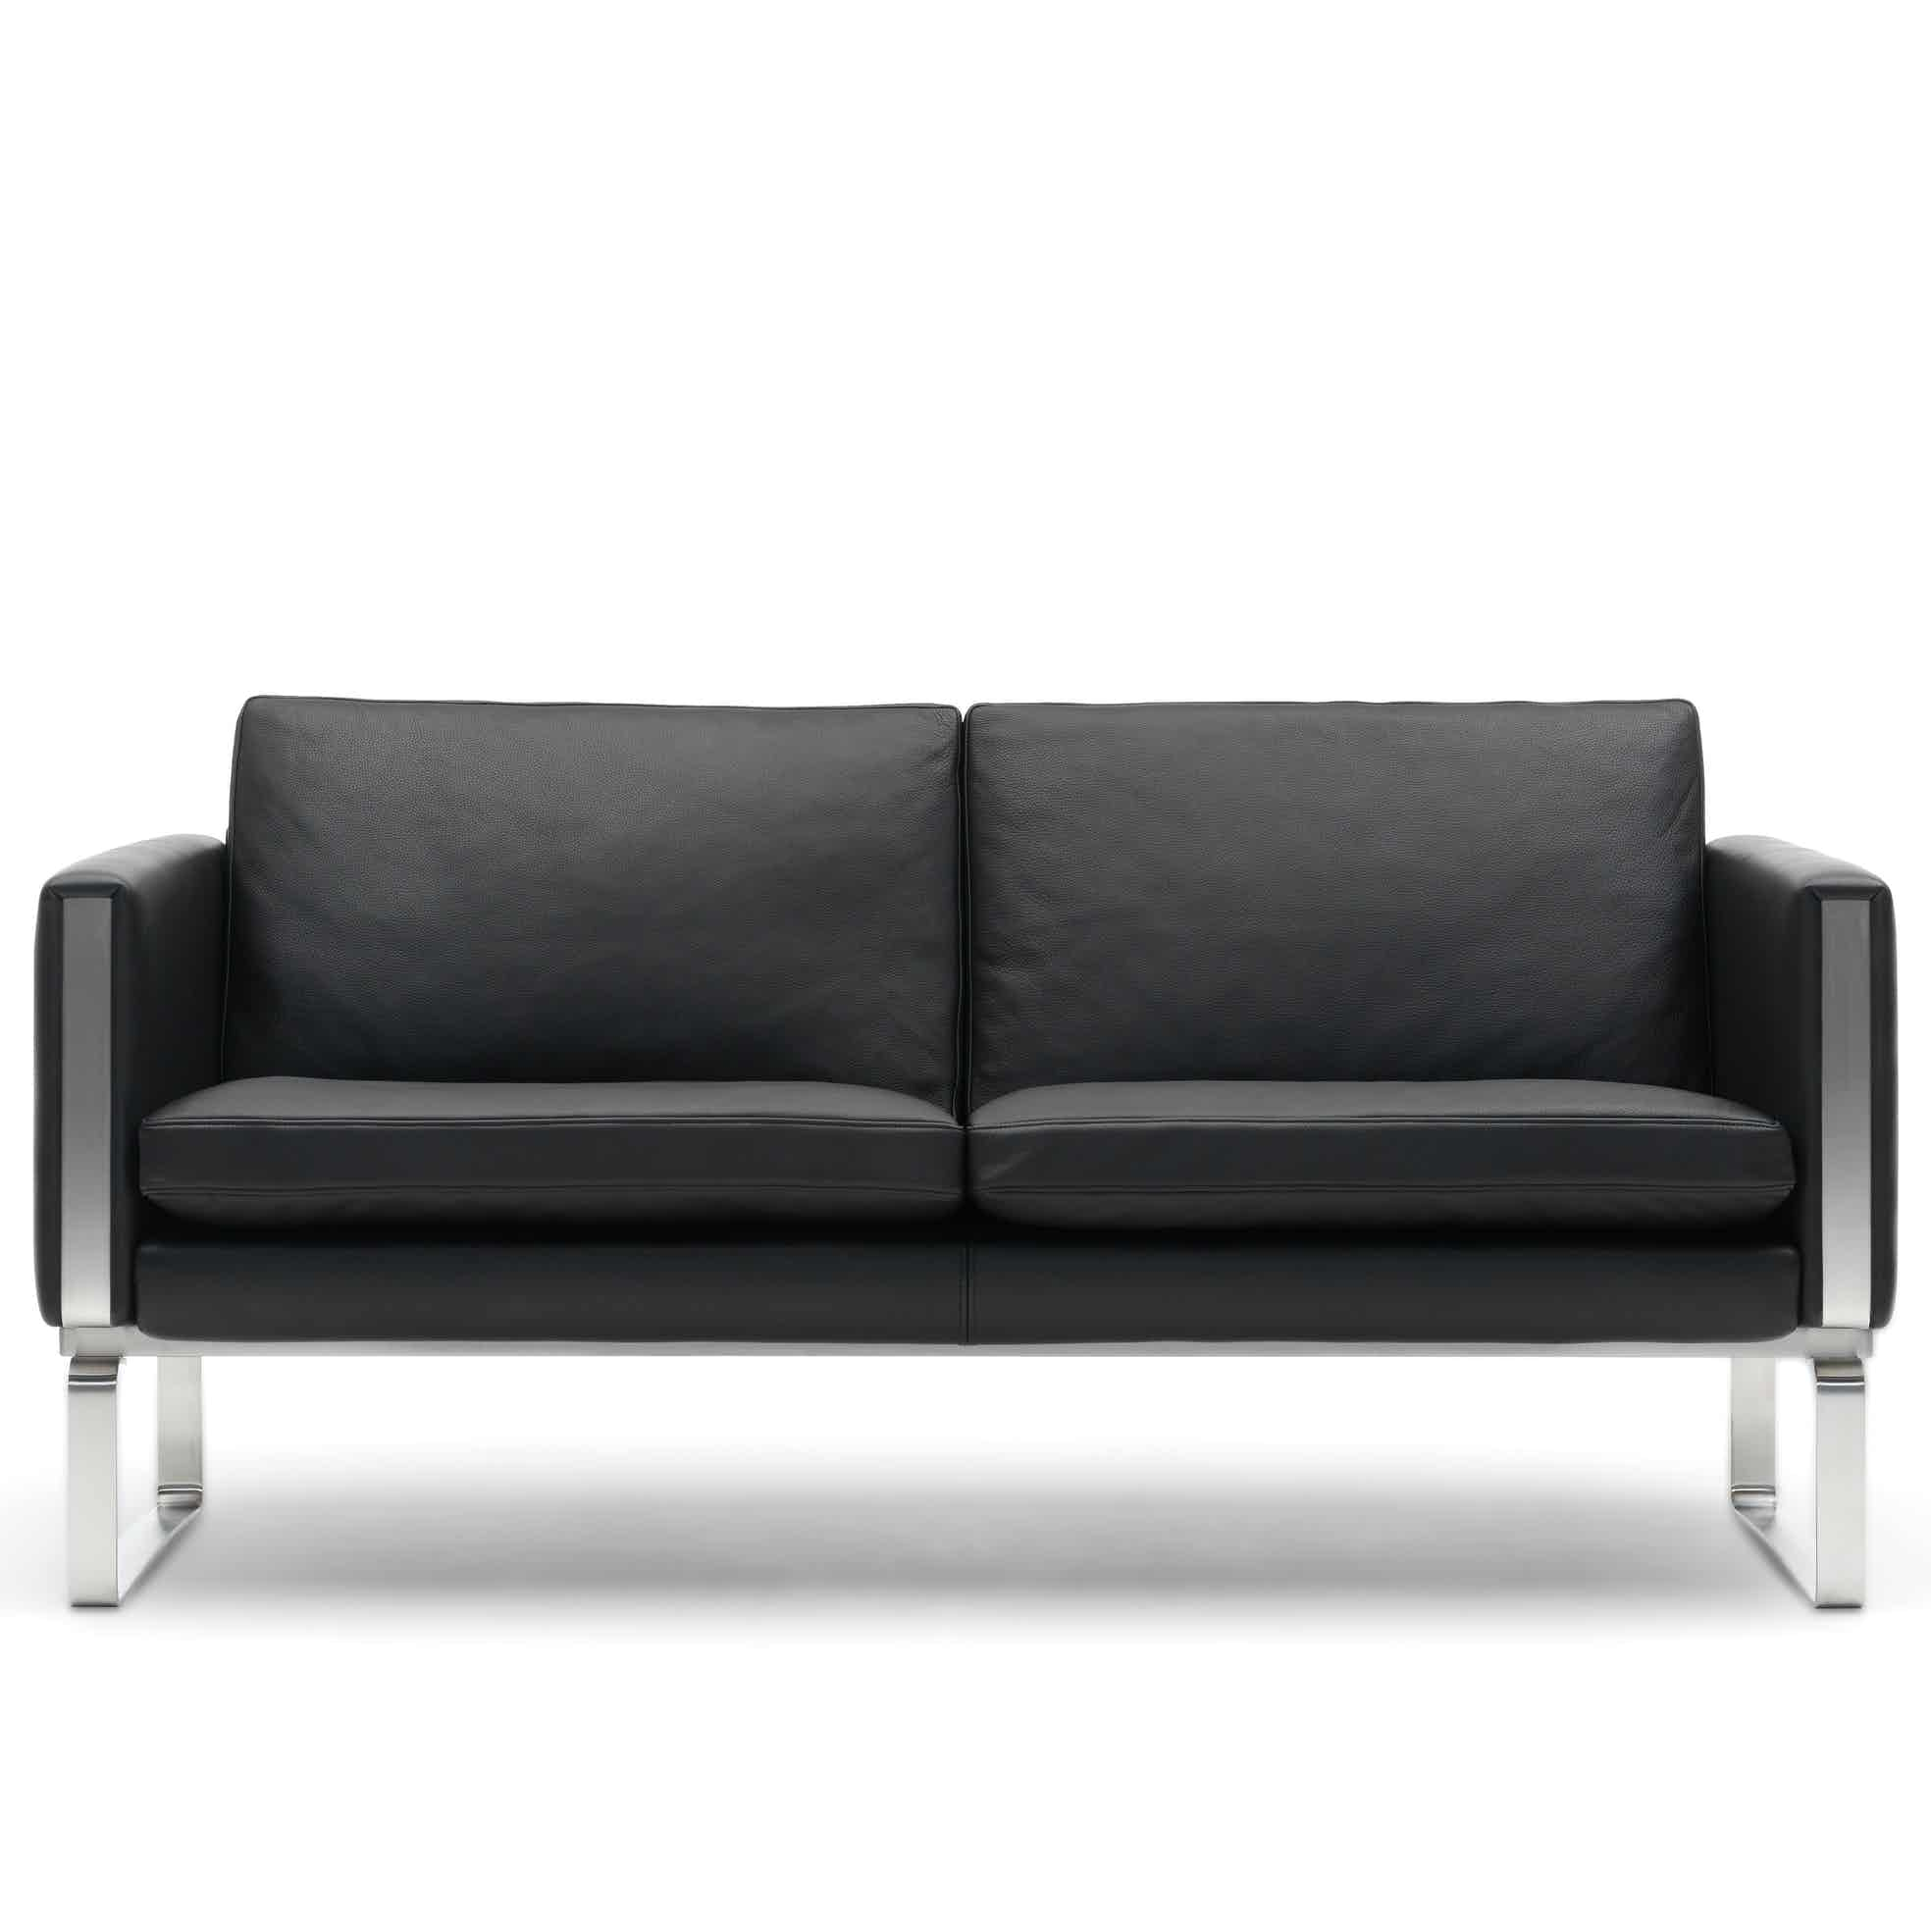 Carl-hansen-son-front-ch102-haute-living